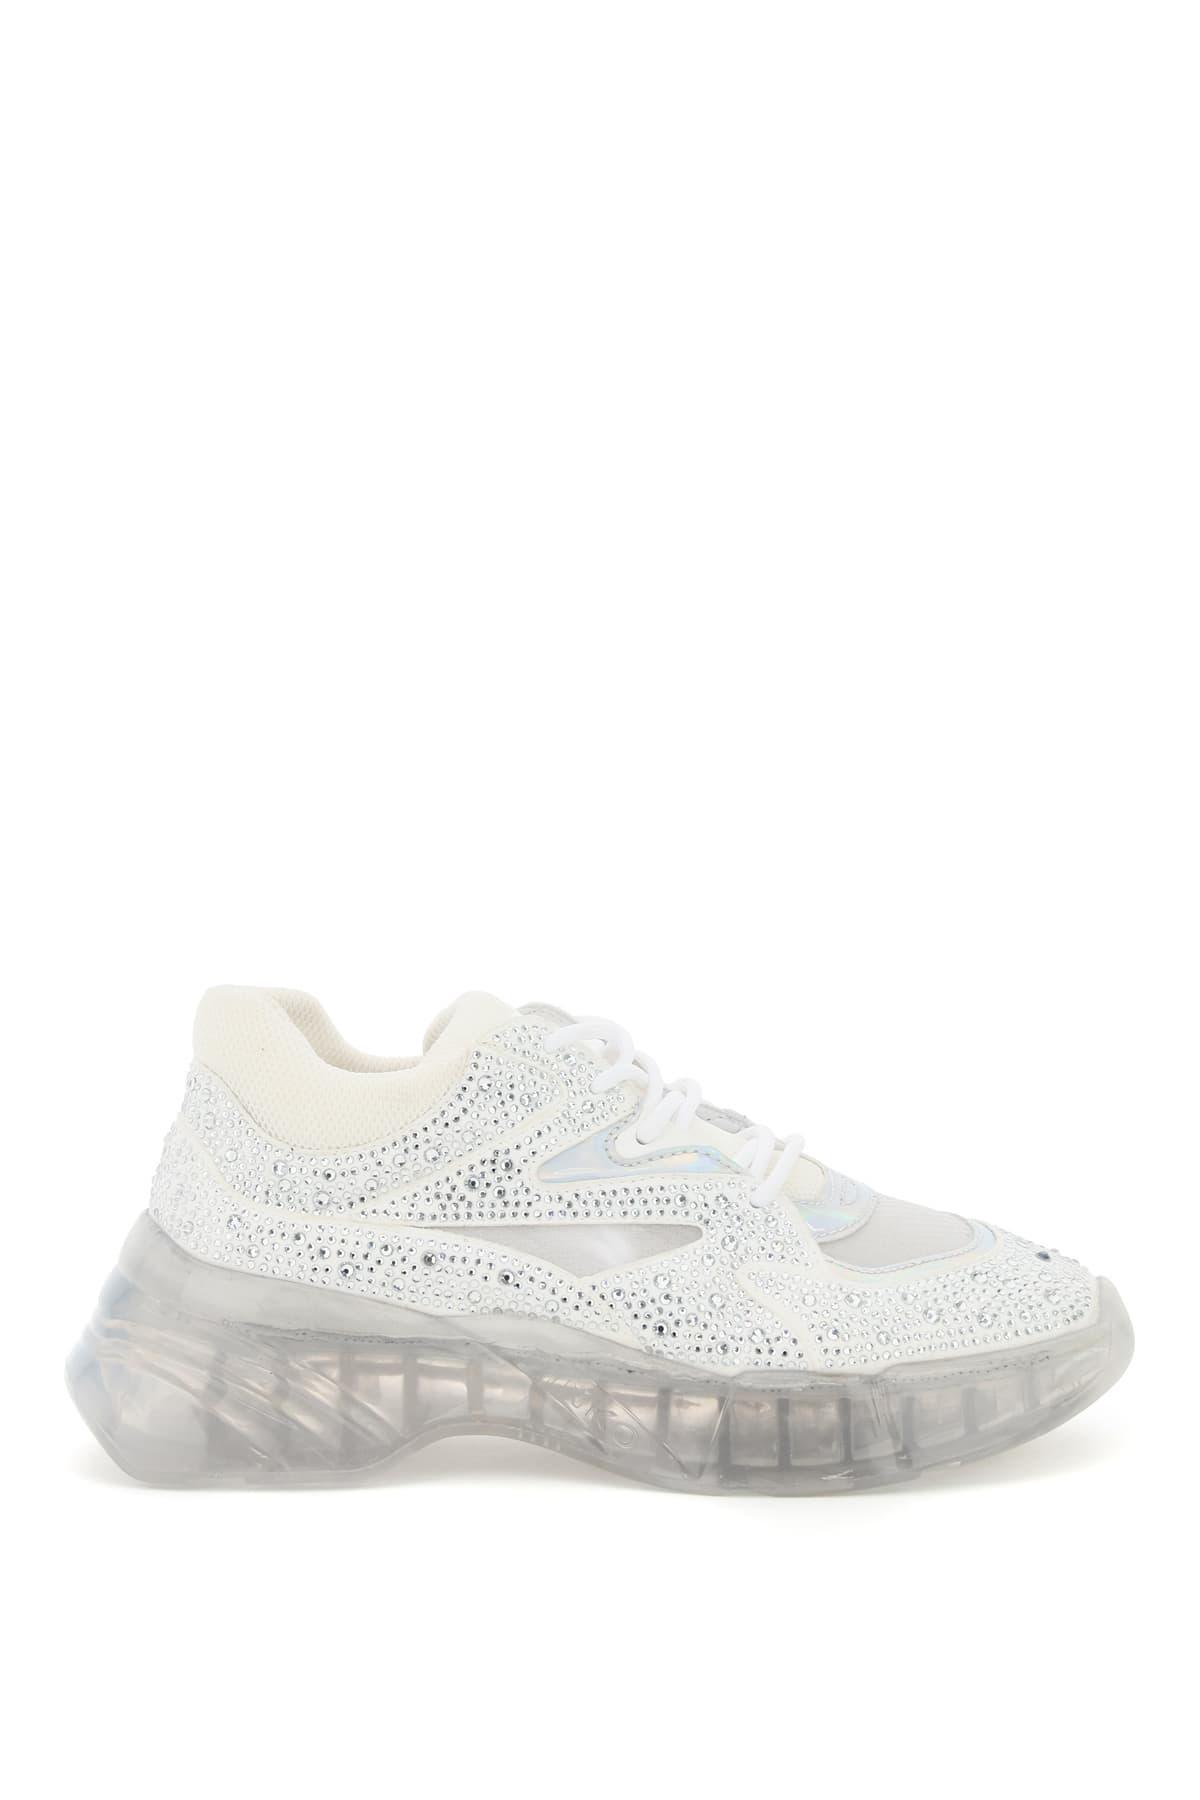 Pinko Sneakers RUBINO DIAMOND 1 SNEAKERS